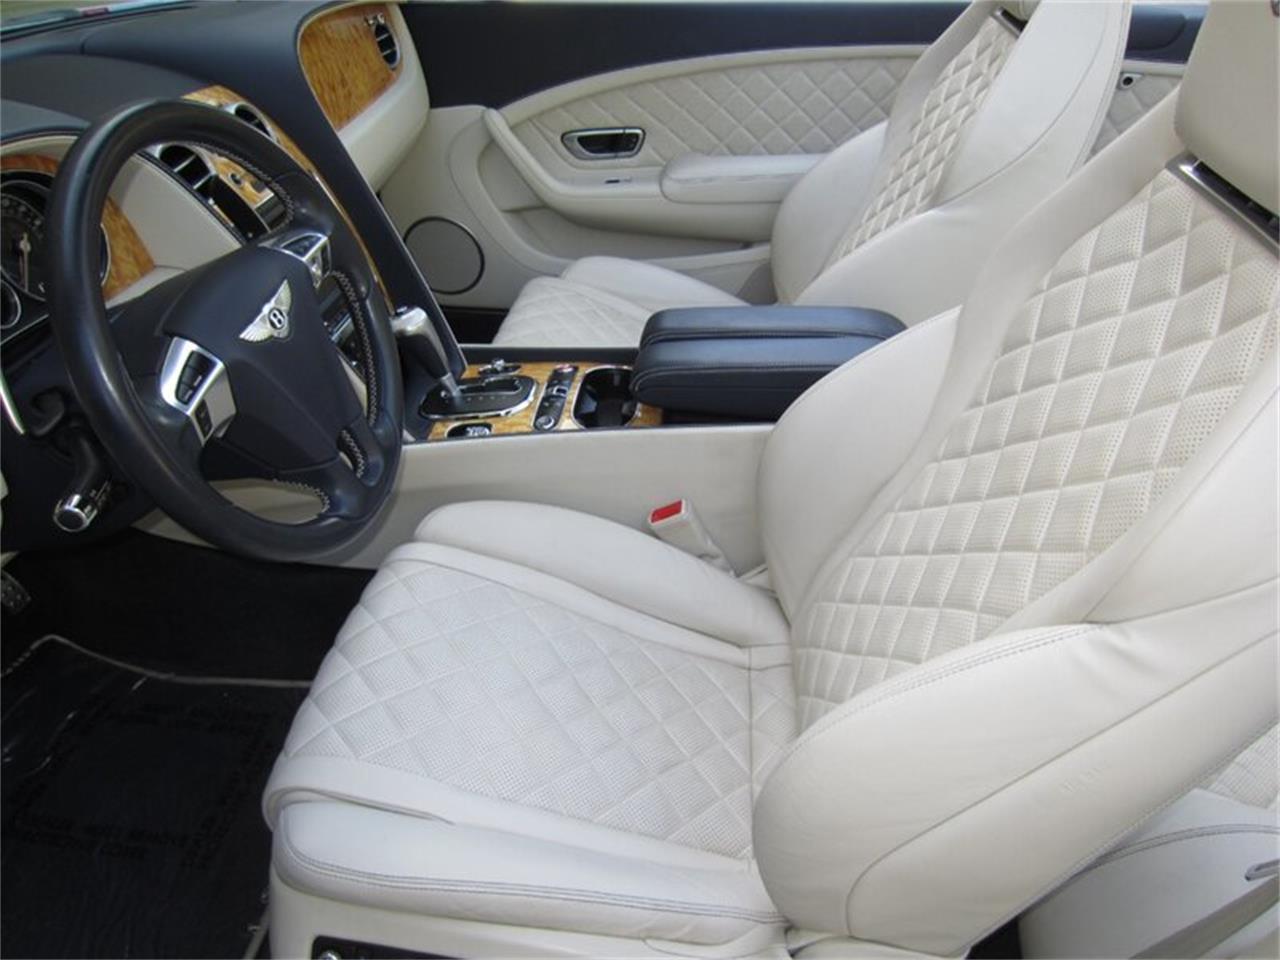 2016 Bentley Continental GT (CC-1298122) for sale in Delray Beach, Florida